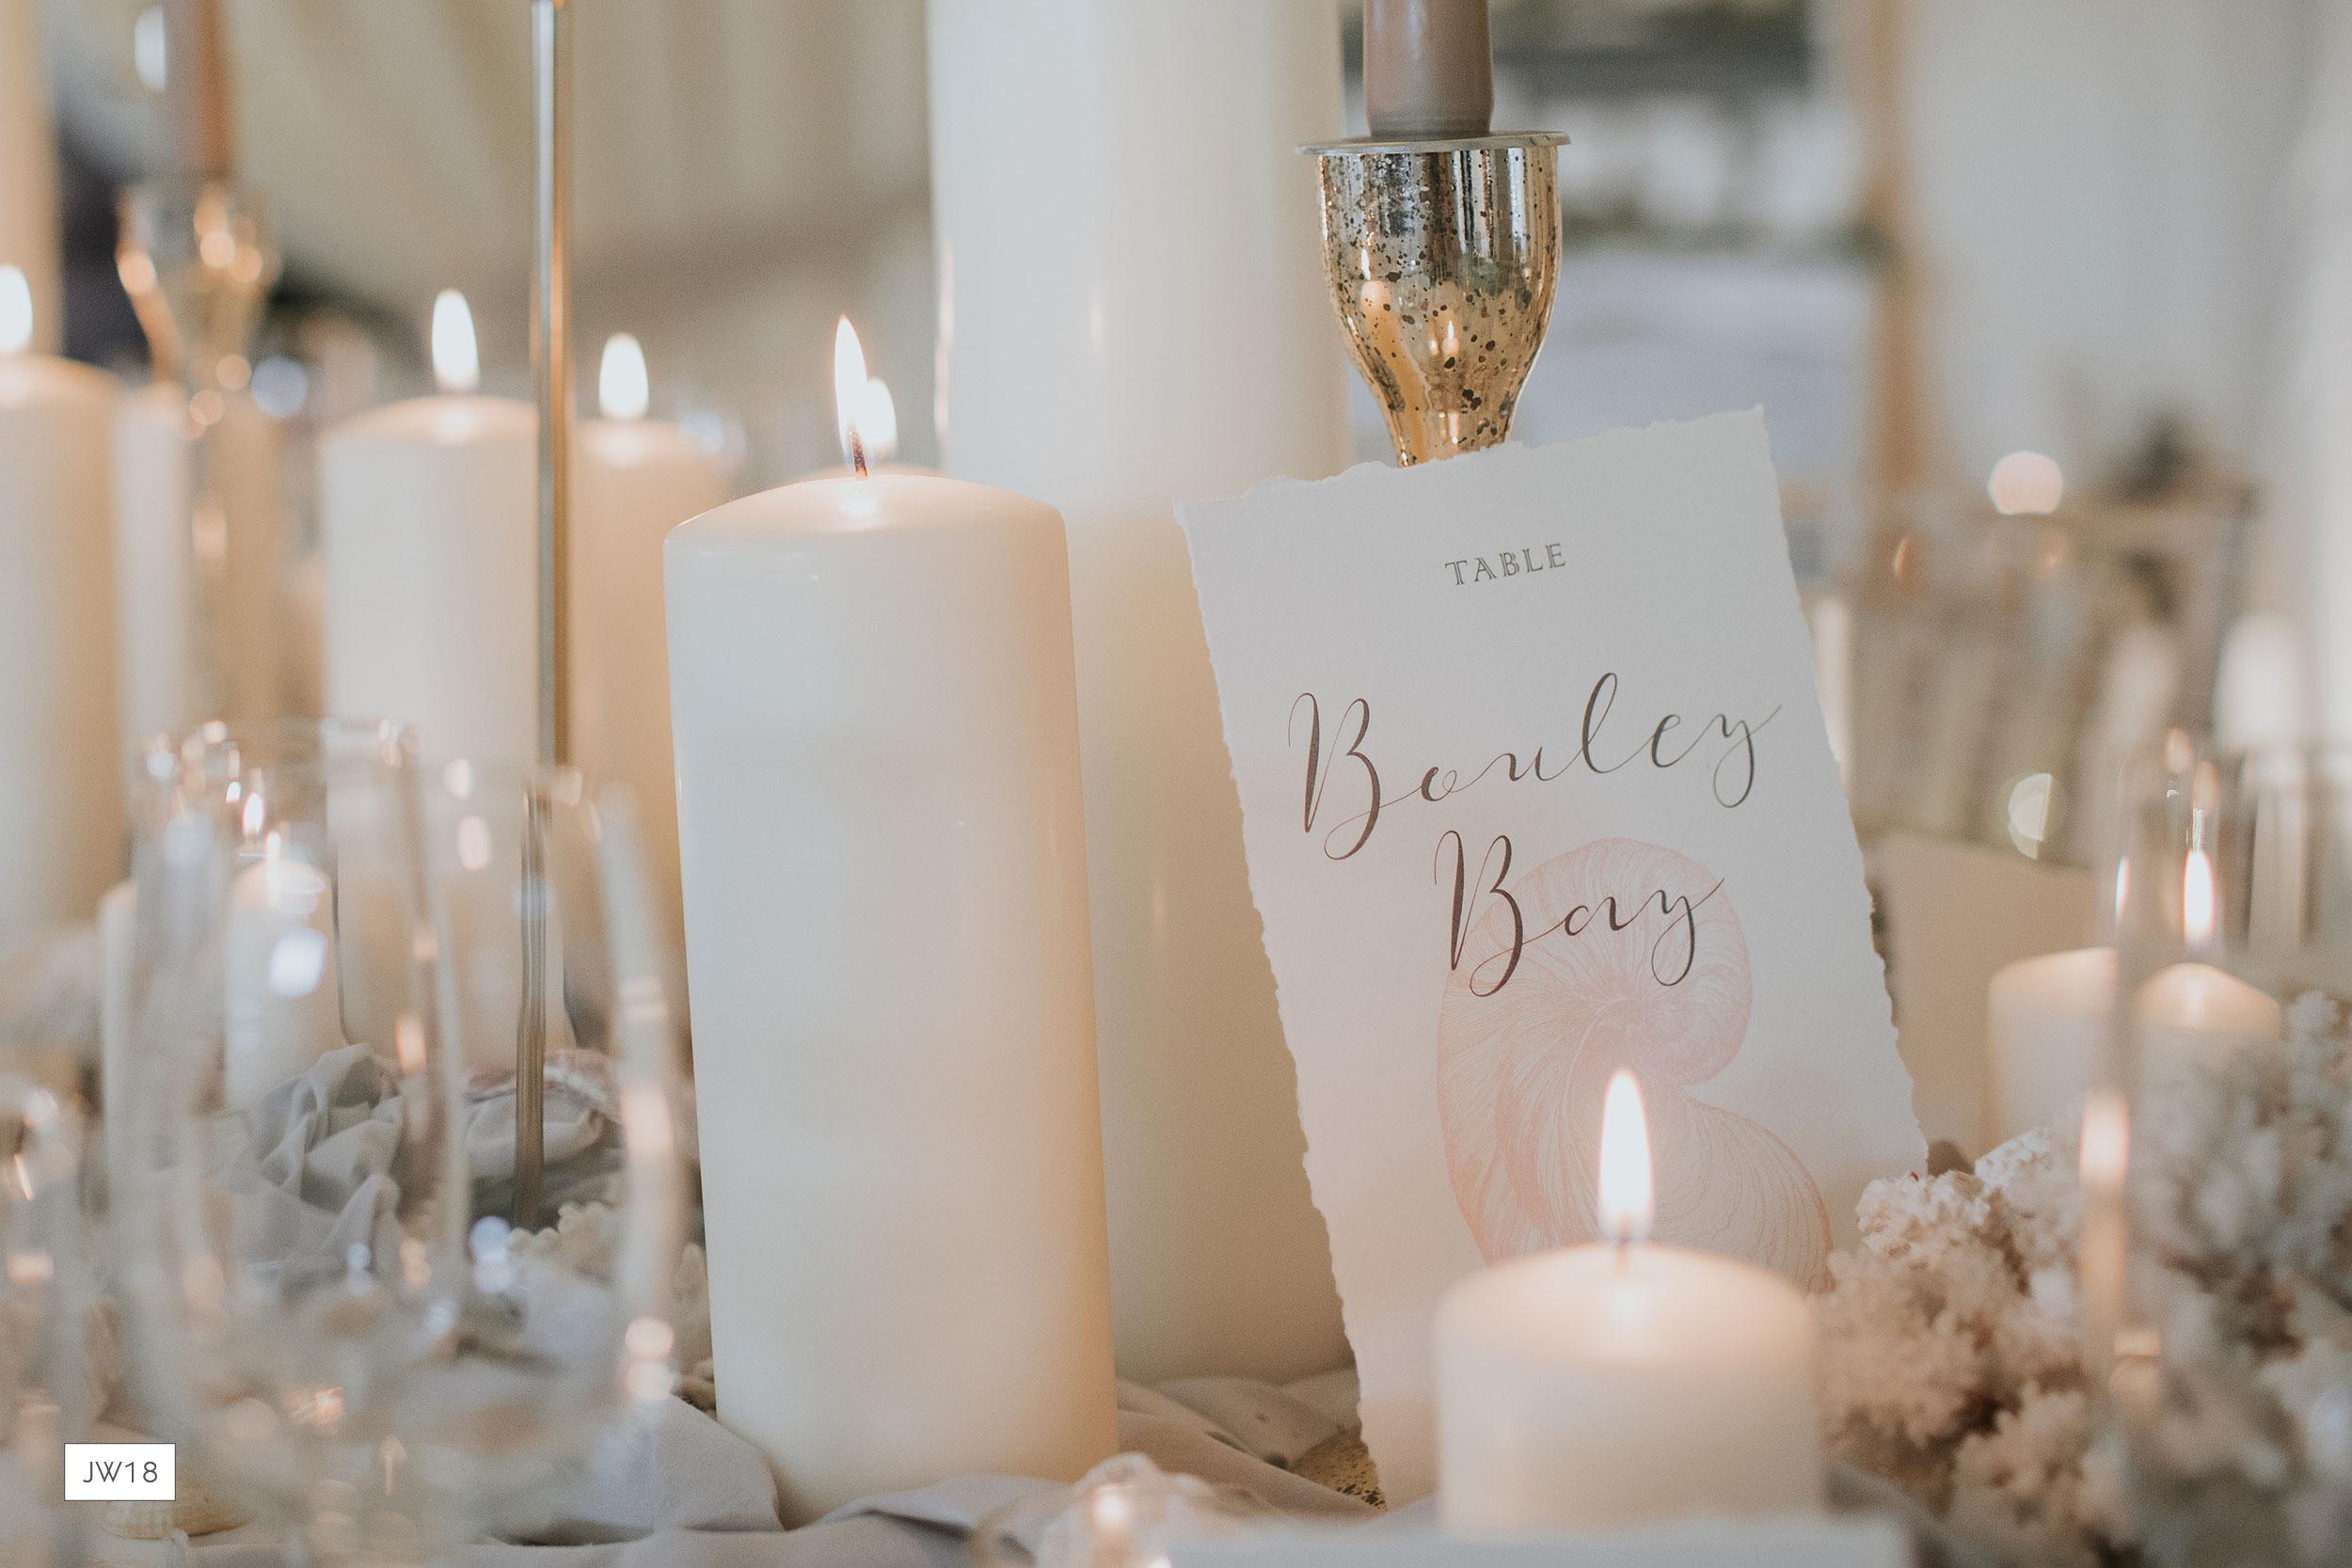 shell-wedding-invitation-table-number-jw18.jpg